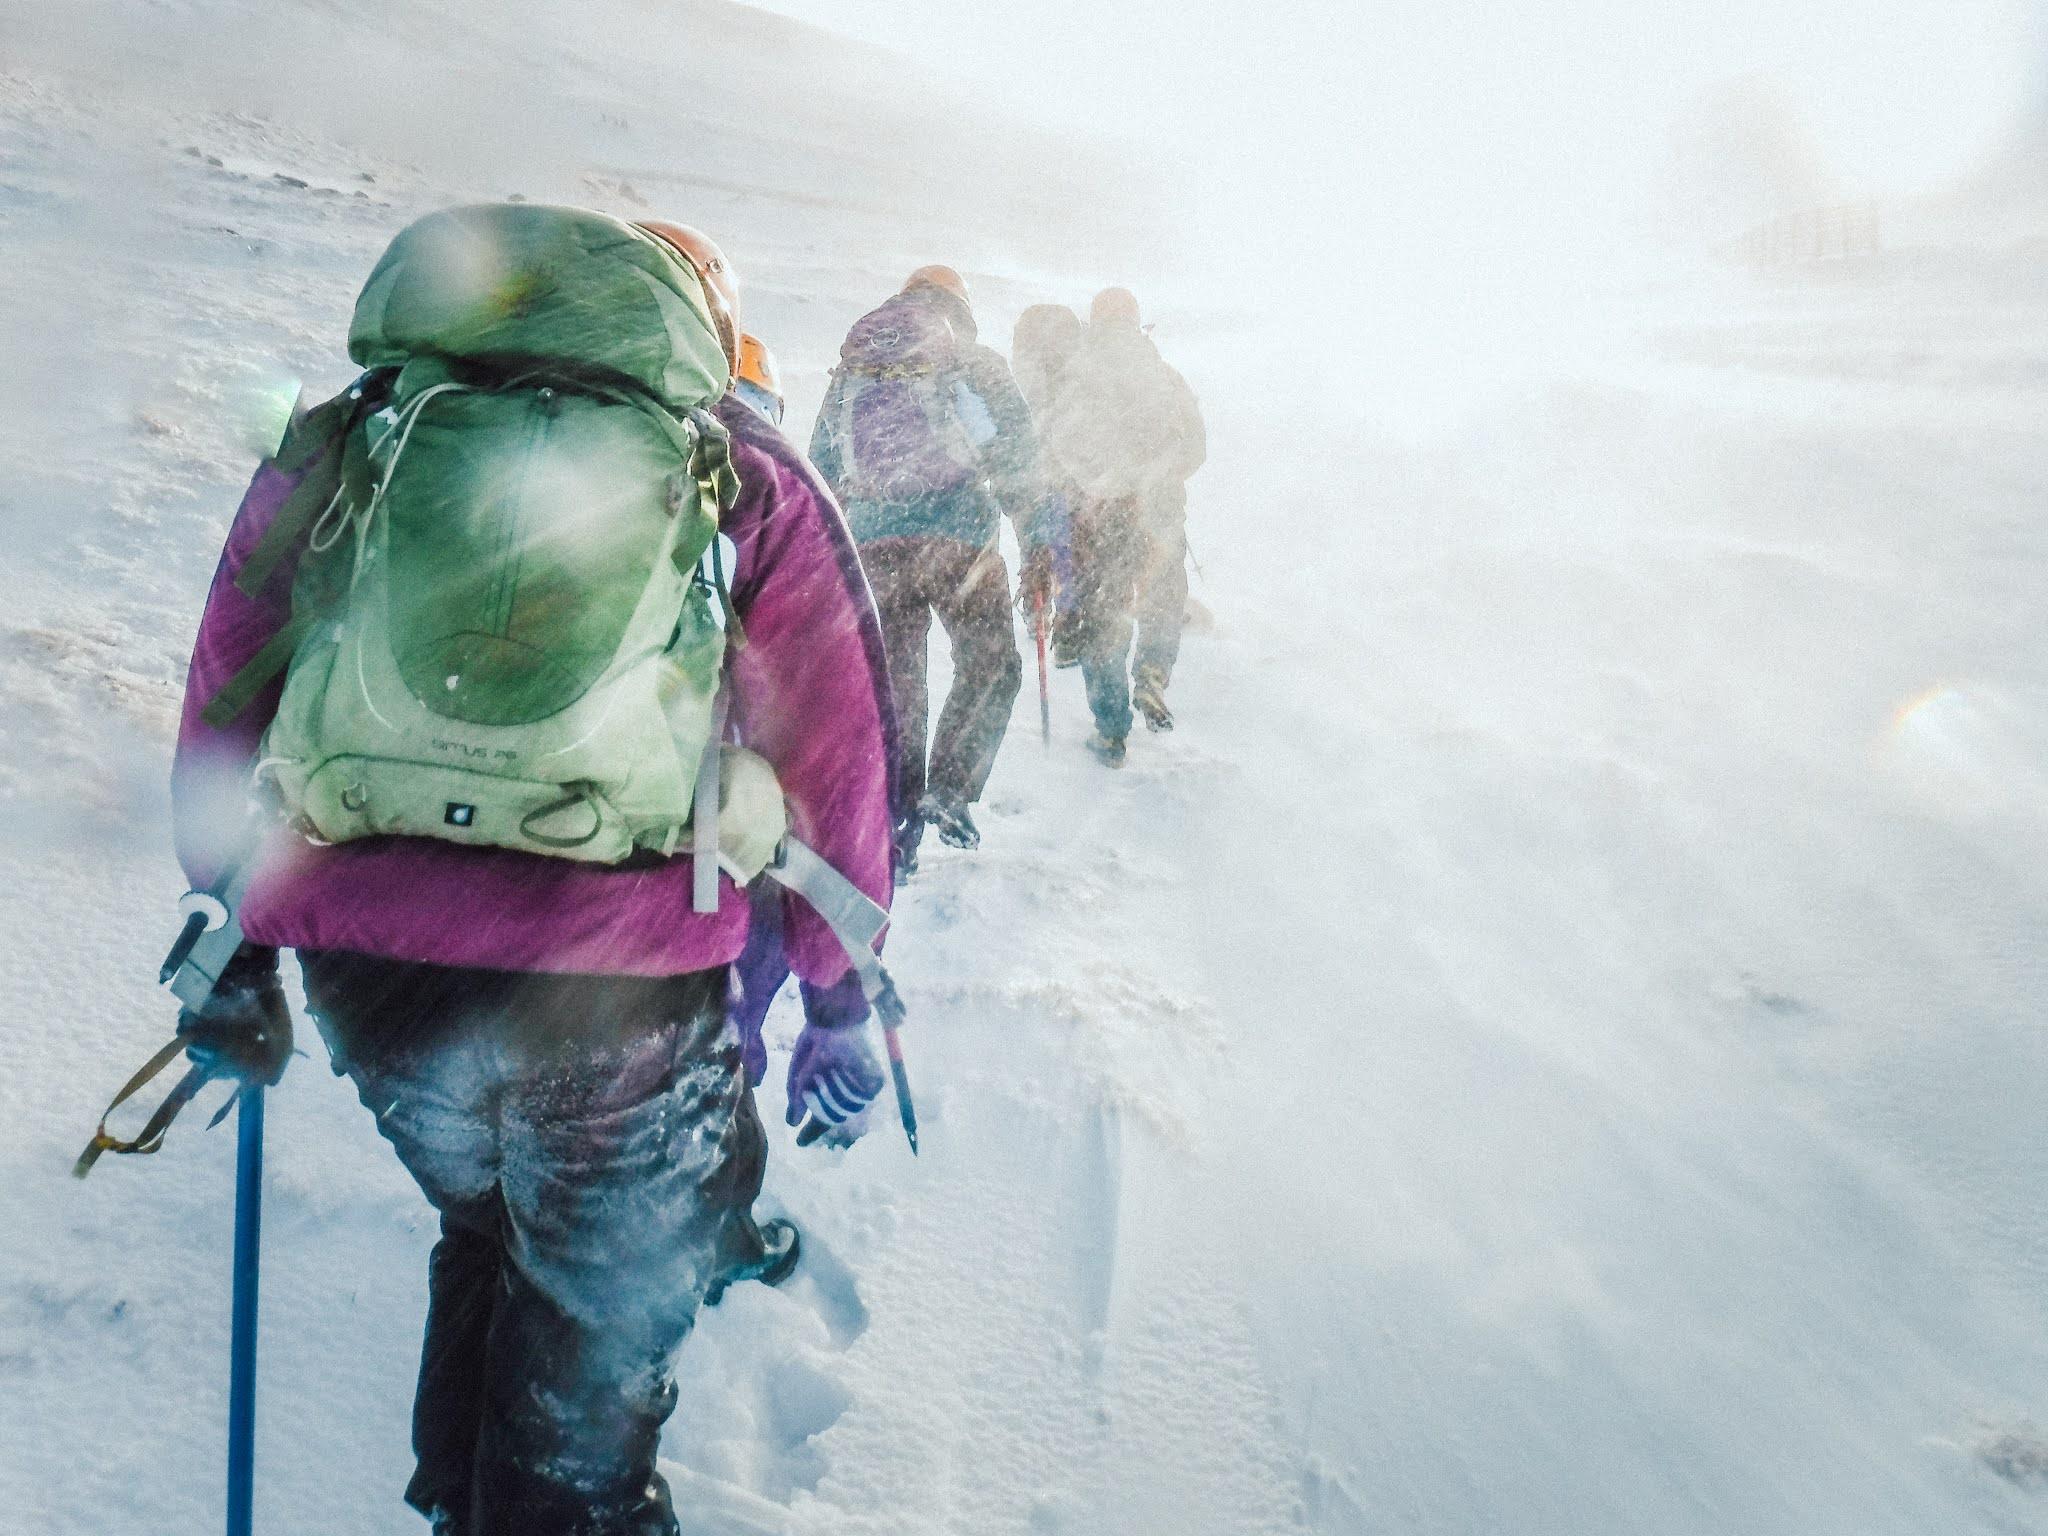 Winter Mountain Skills Course in the Cairngorms liquidgrain liquid grain